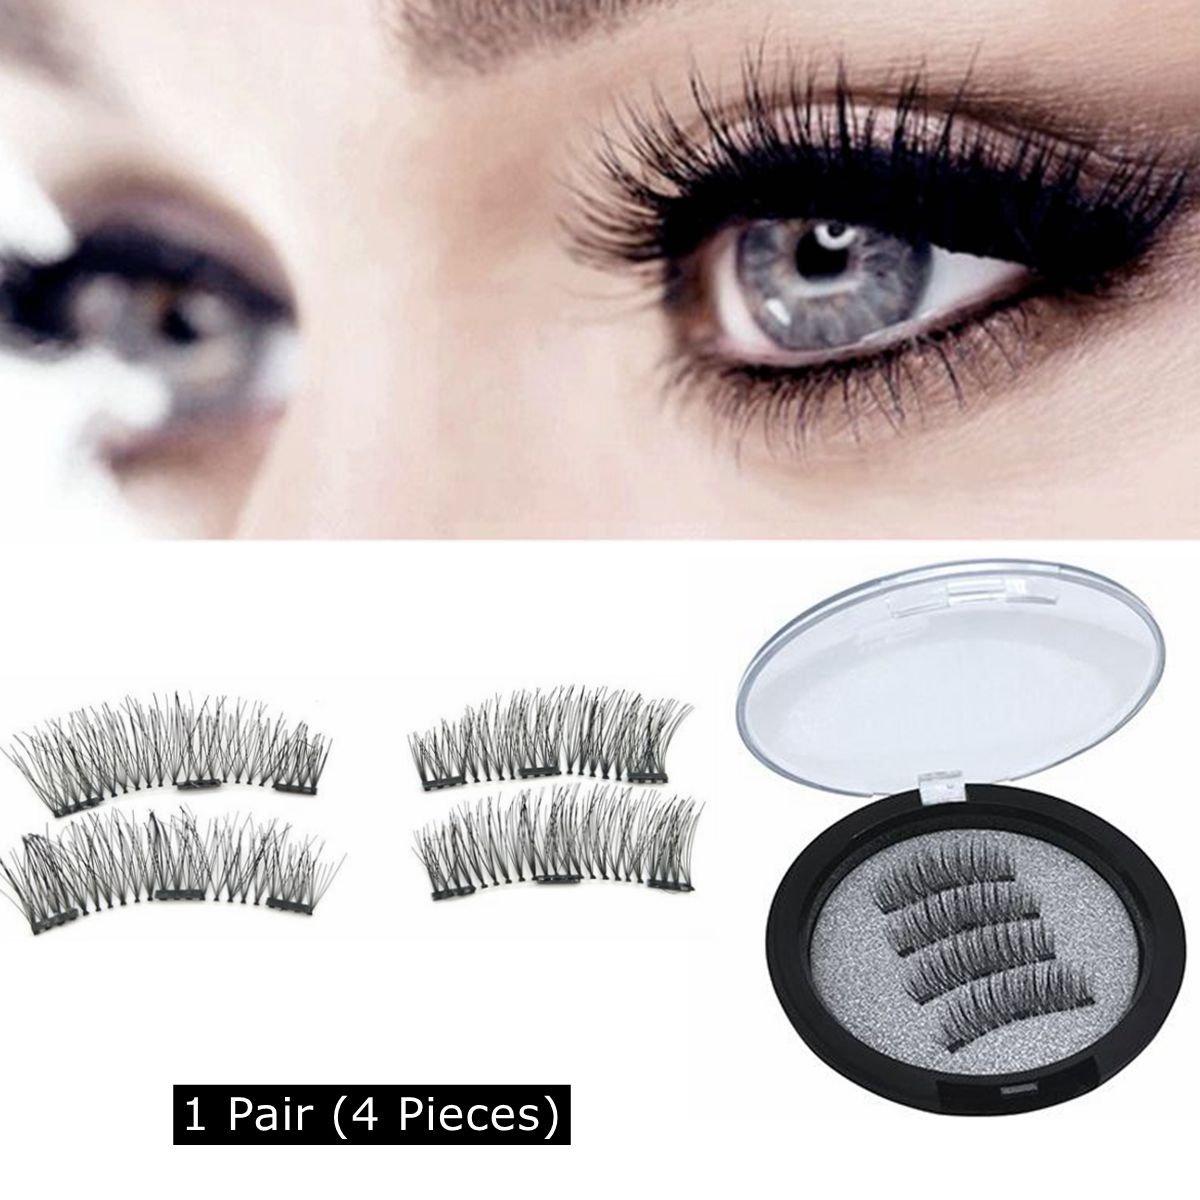 37c46ec4558 Amazon.com : Full Size 3D Magnetic False Eyelashes, cnokfan Triple Magnetic  Lashes Natural Look Eyelids, No Glue, Irritation-Free, Quick Paste Reusable  ...